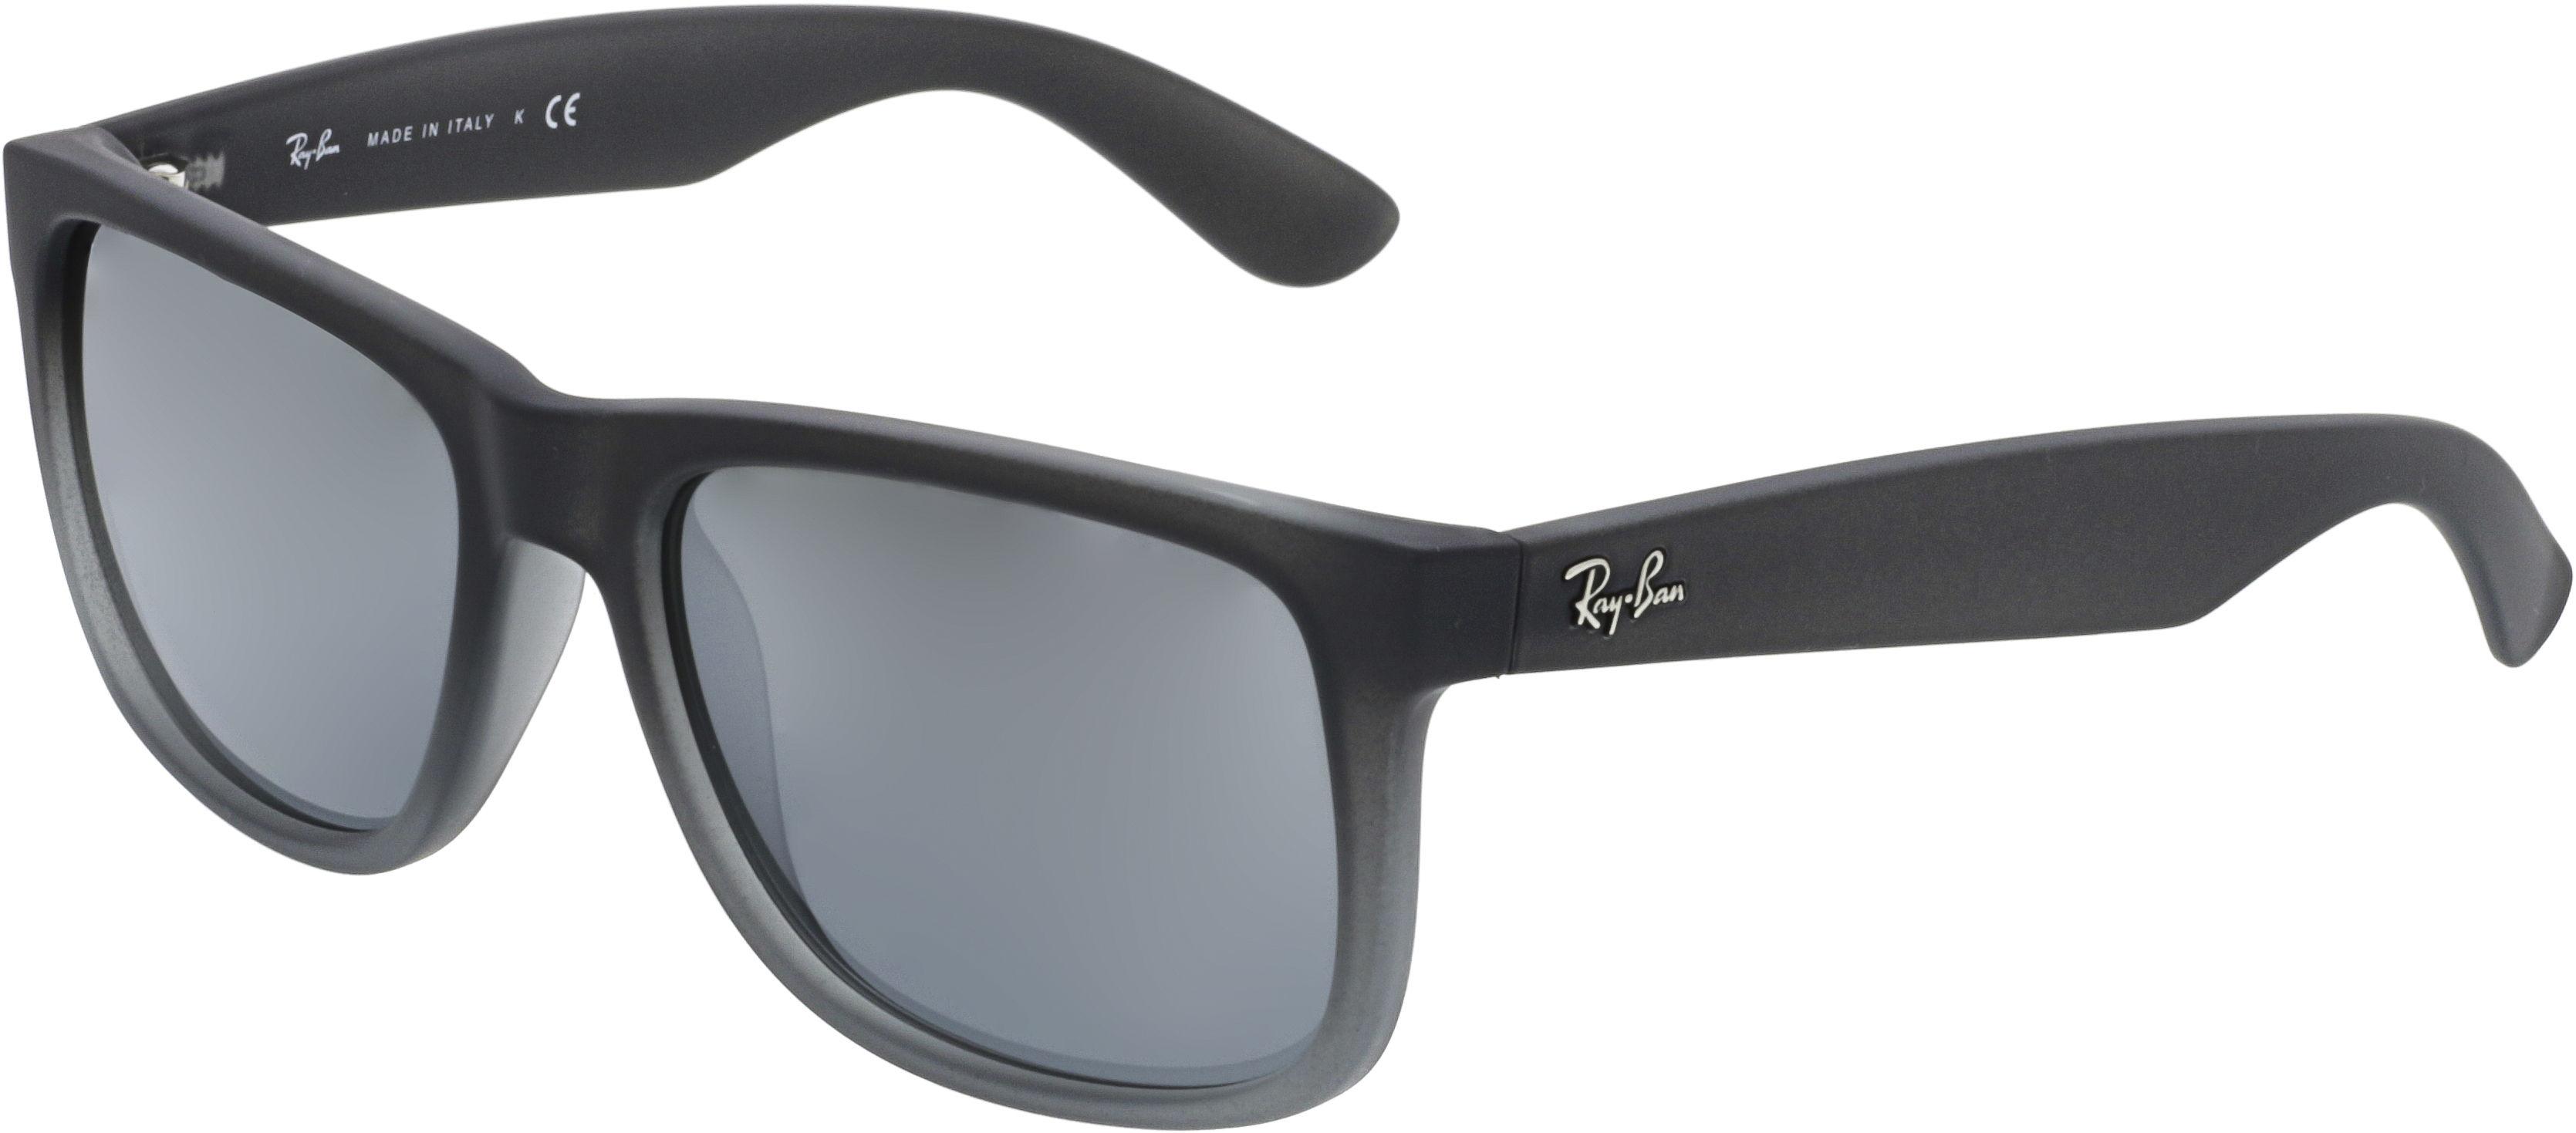 3c8c77a0f Ray-Ban Men's Mirrored Justin RB4165-852/88-54 Grey Square Sunglasses -  $64.99 + FS